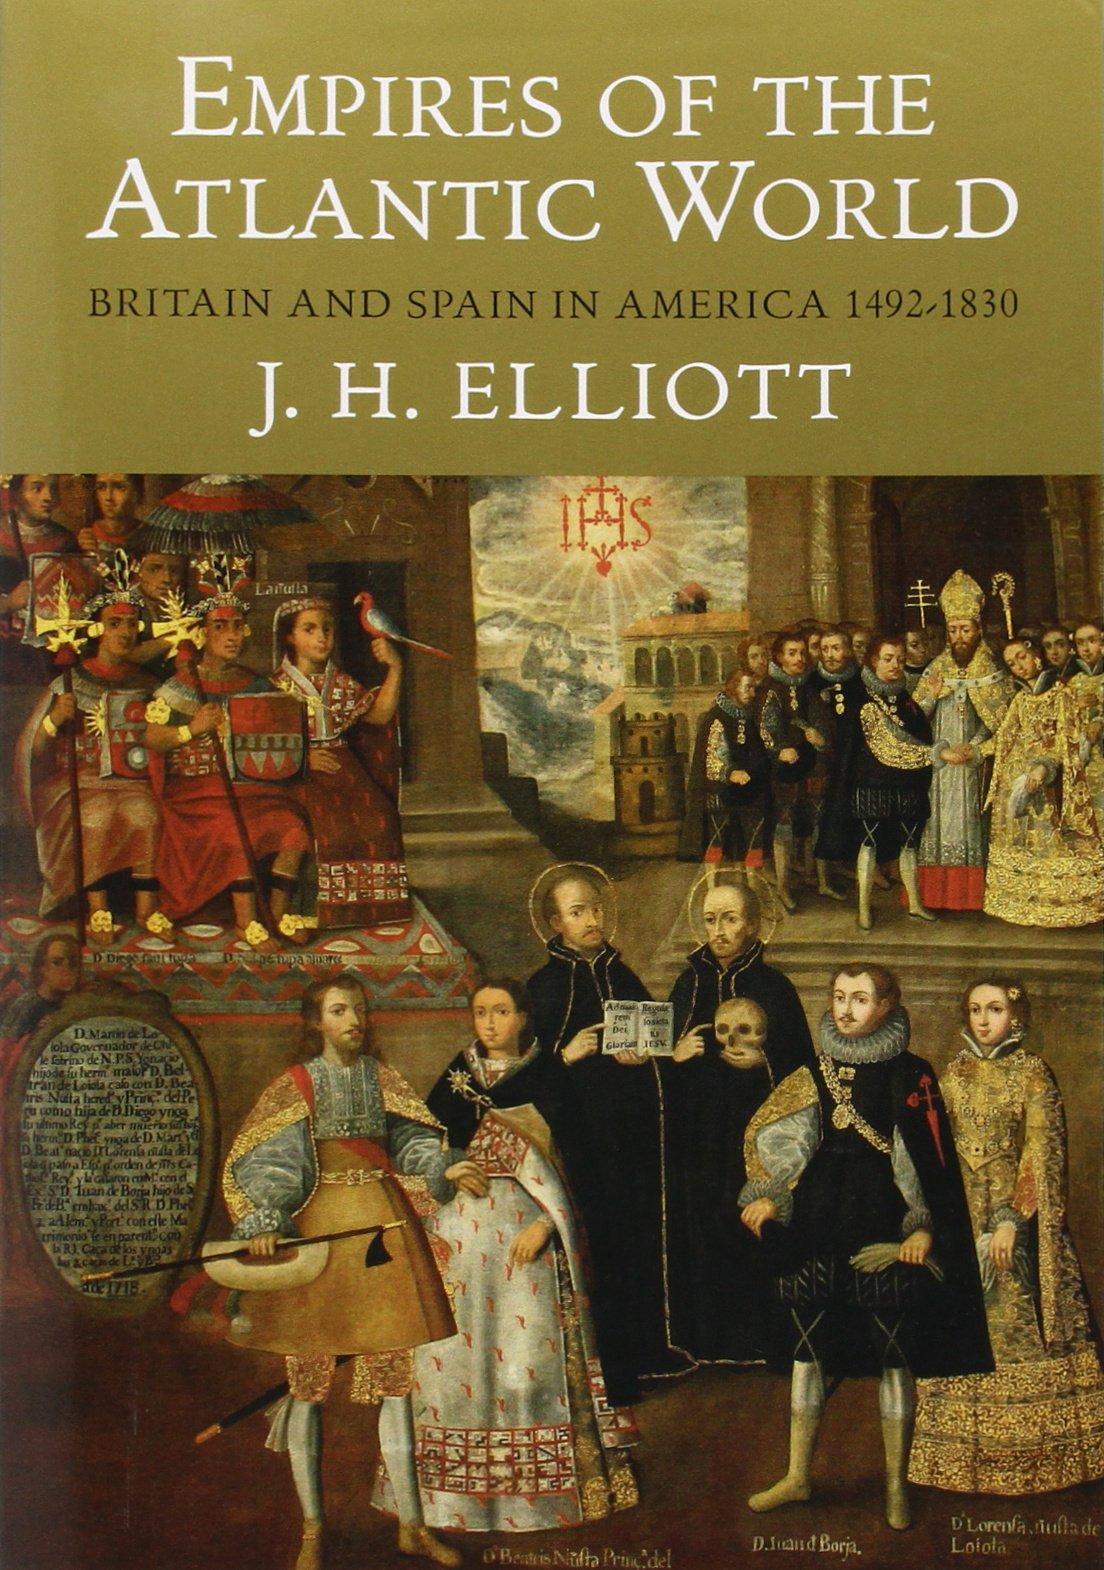 Empires of the Atlantic World: Britain and Spain in America 1492-1830: John  H. Elliott: 9780300123999: Amazon.com: Books